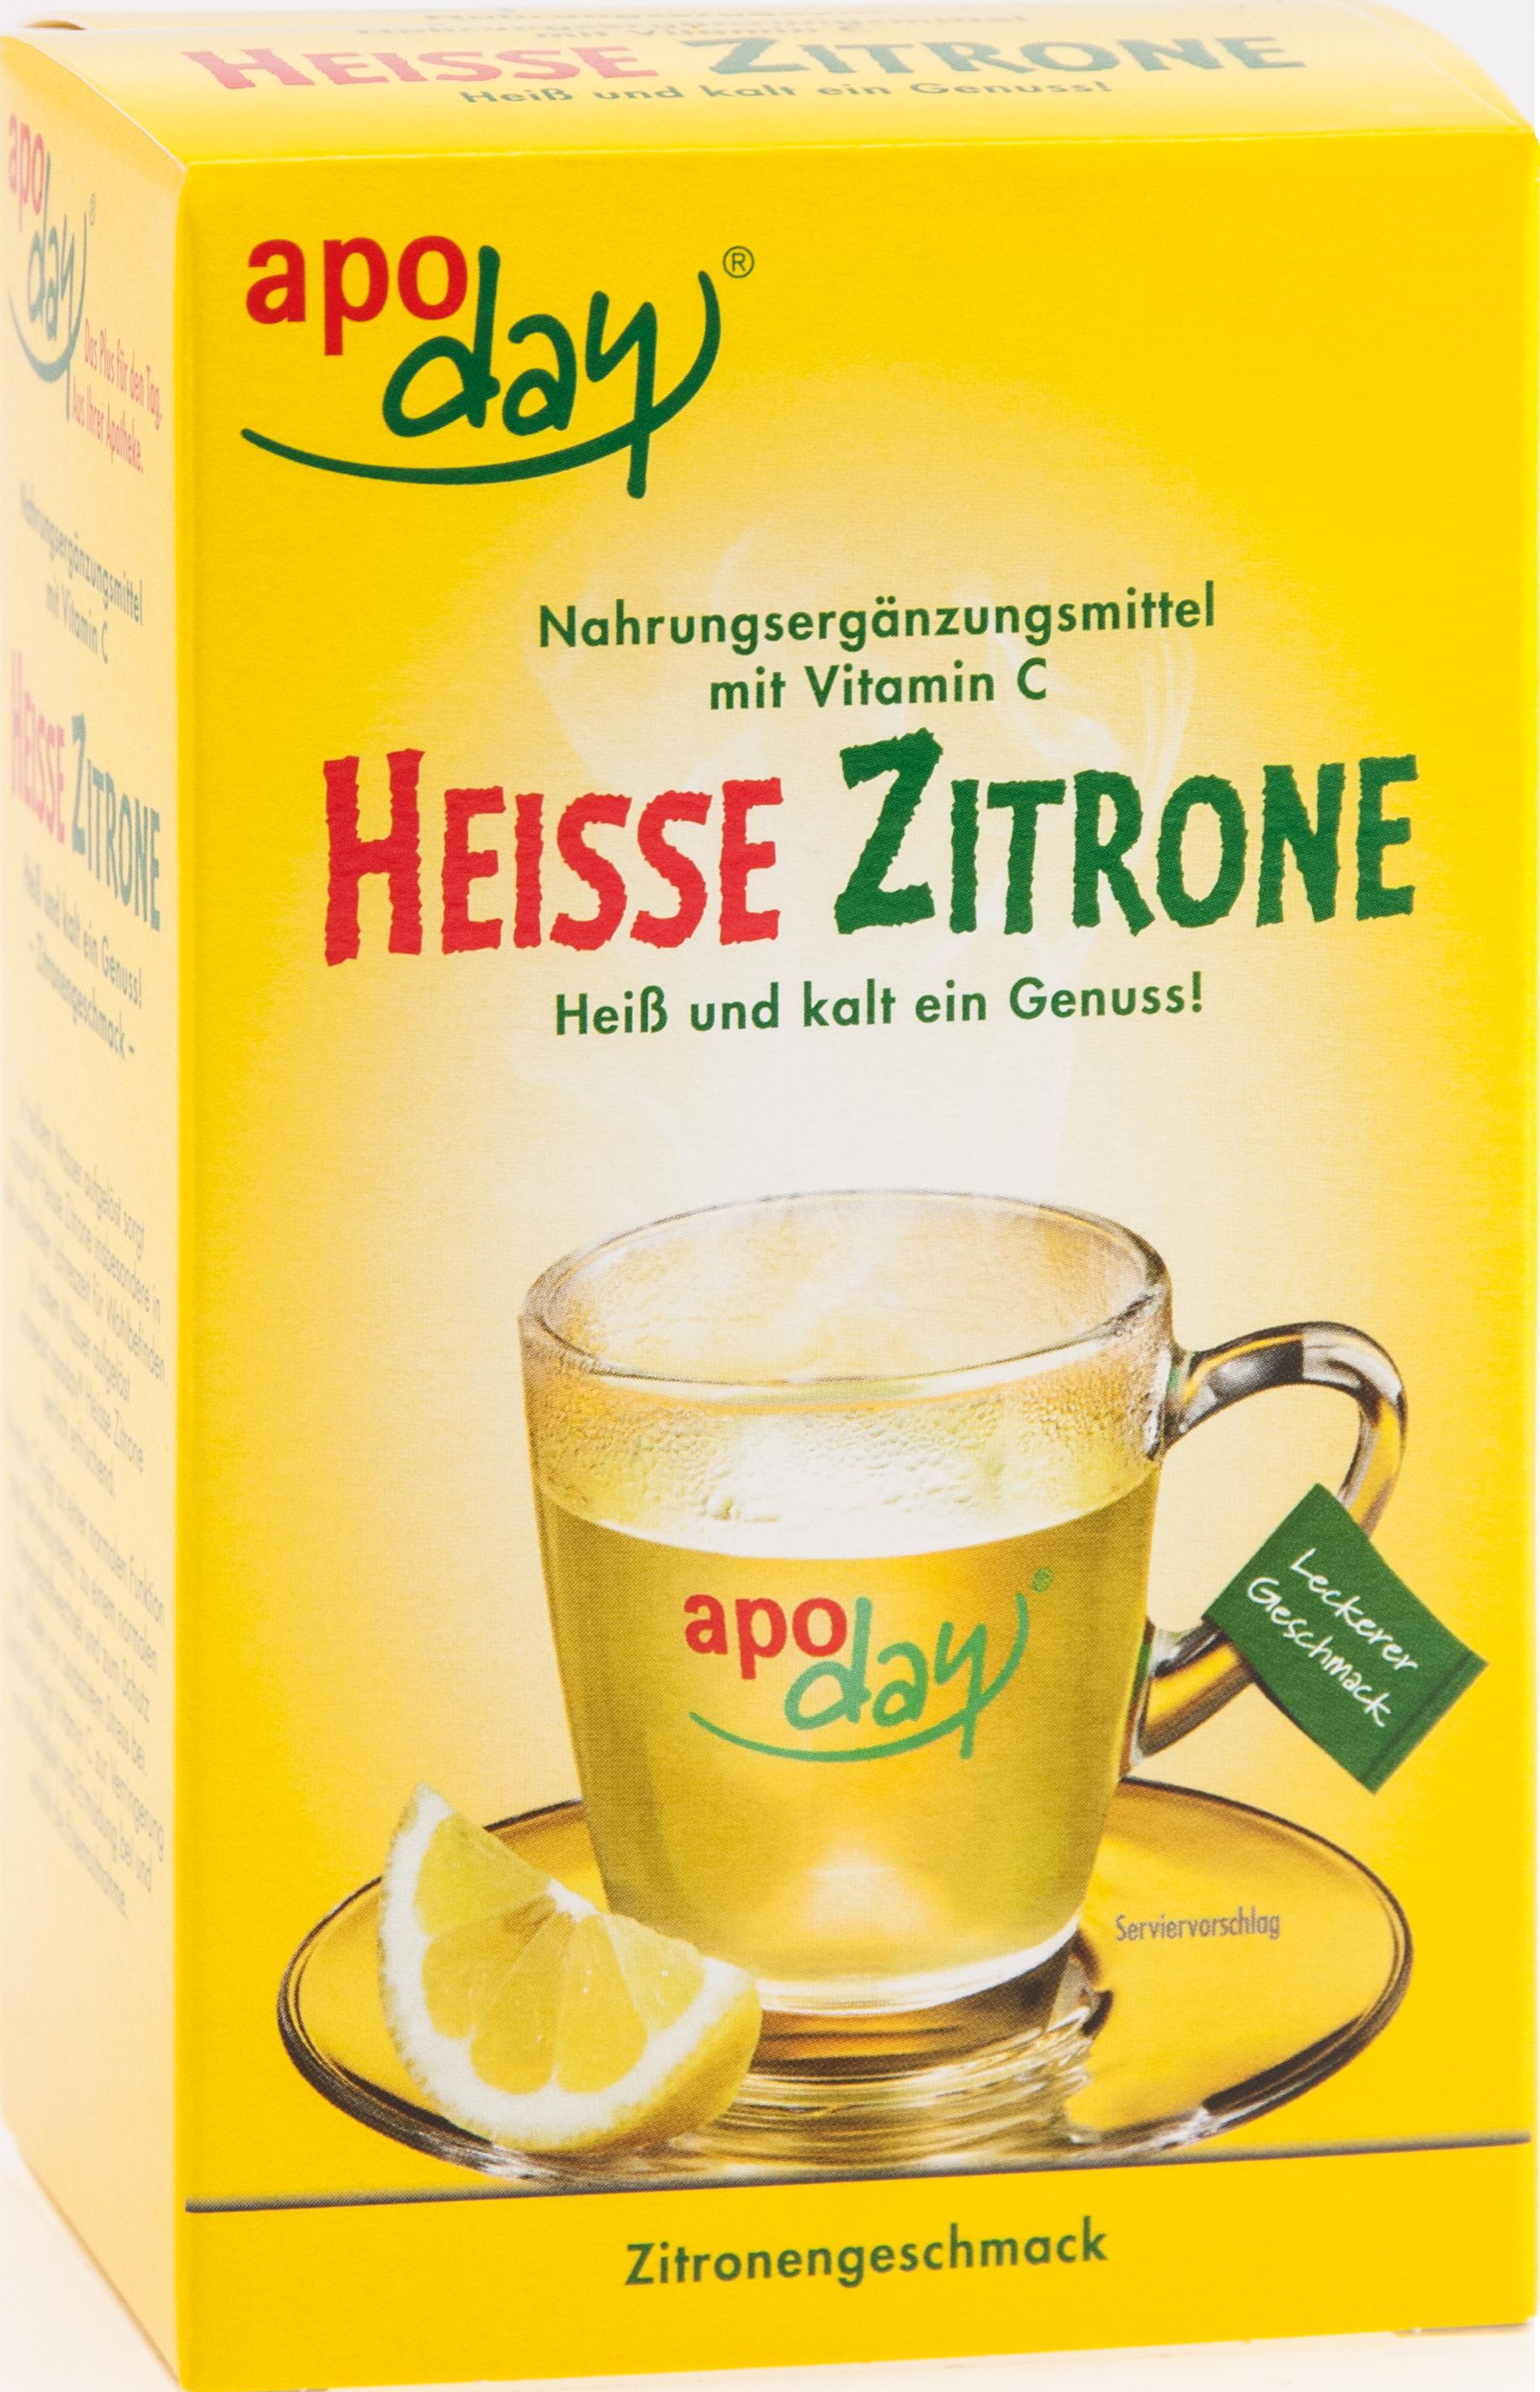 apoday Heisse Zitrone Vitamin C